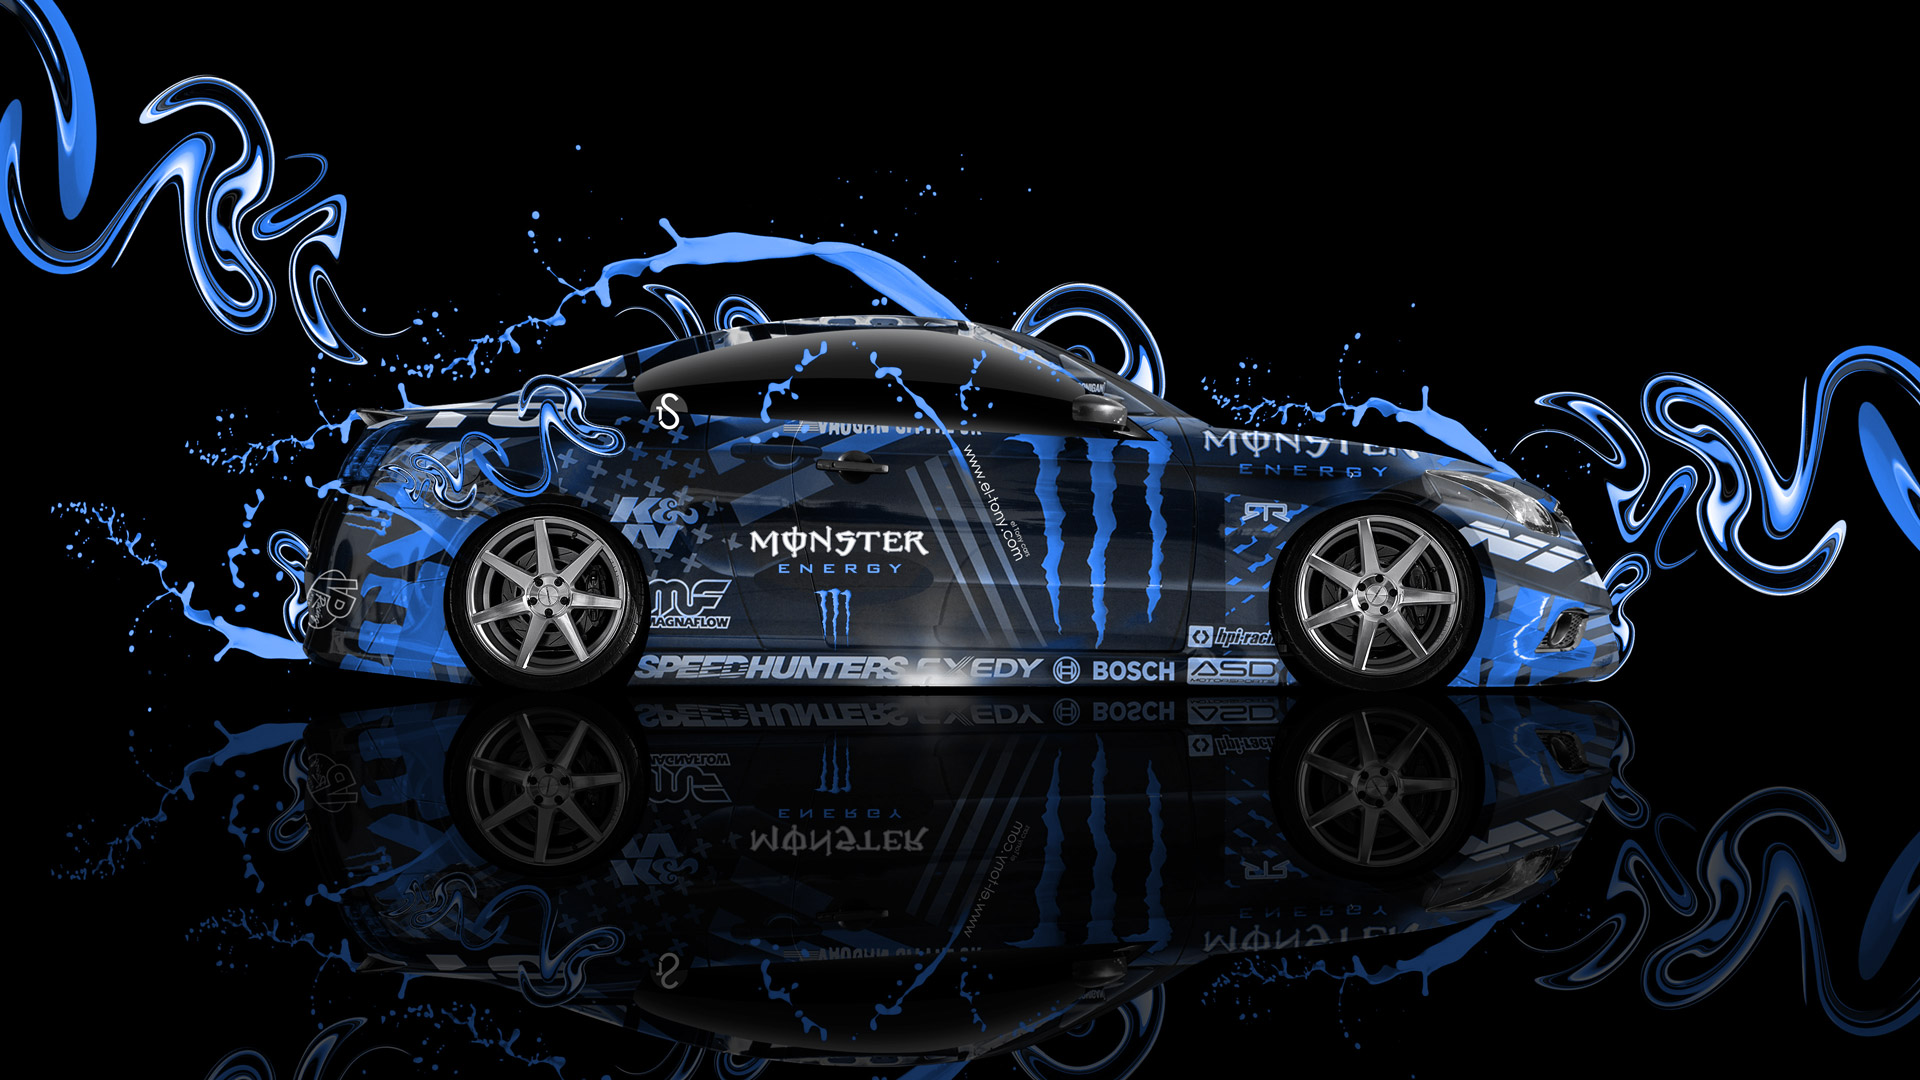 Monster Energy Infiniti G37 Side Plastic Blue Live Colors Car 2014 HD 1920x1080